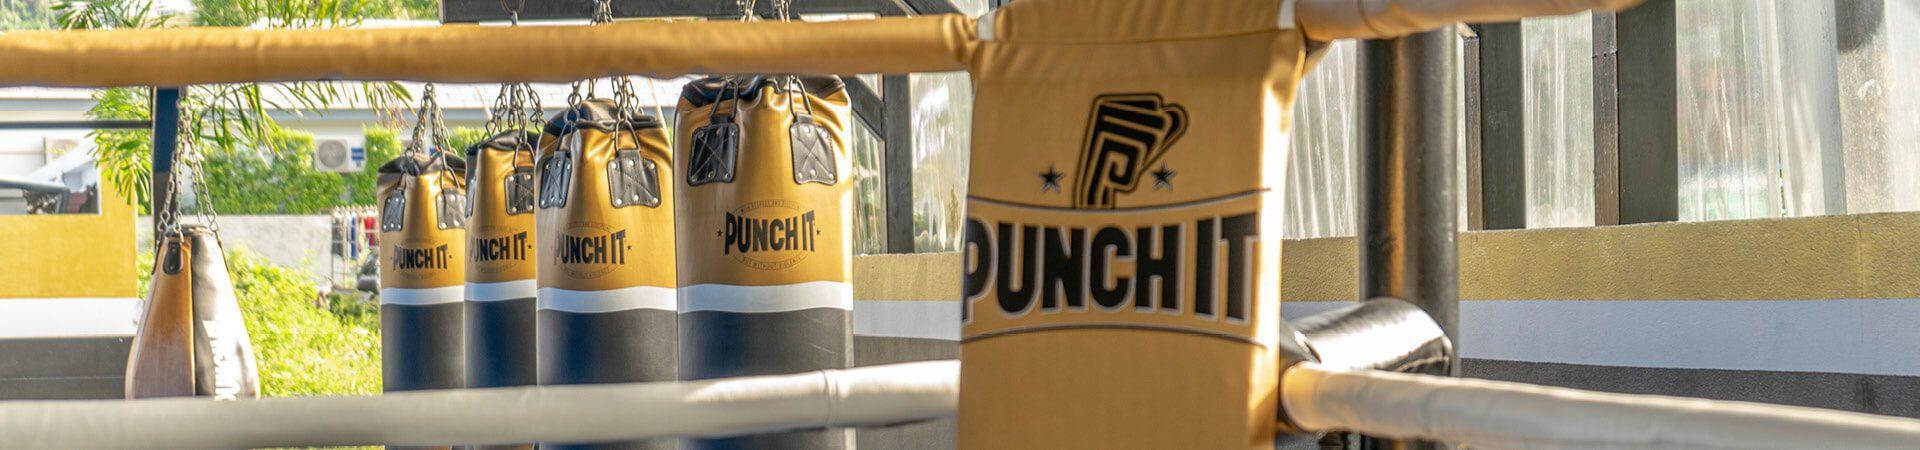 Imprint Punchit Muay Thai Gym